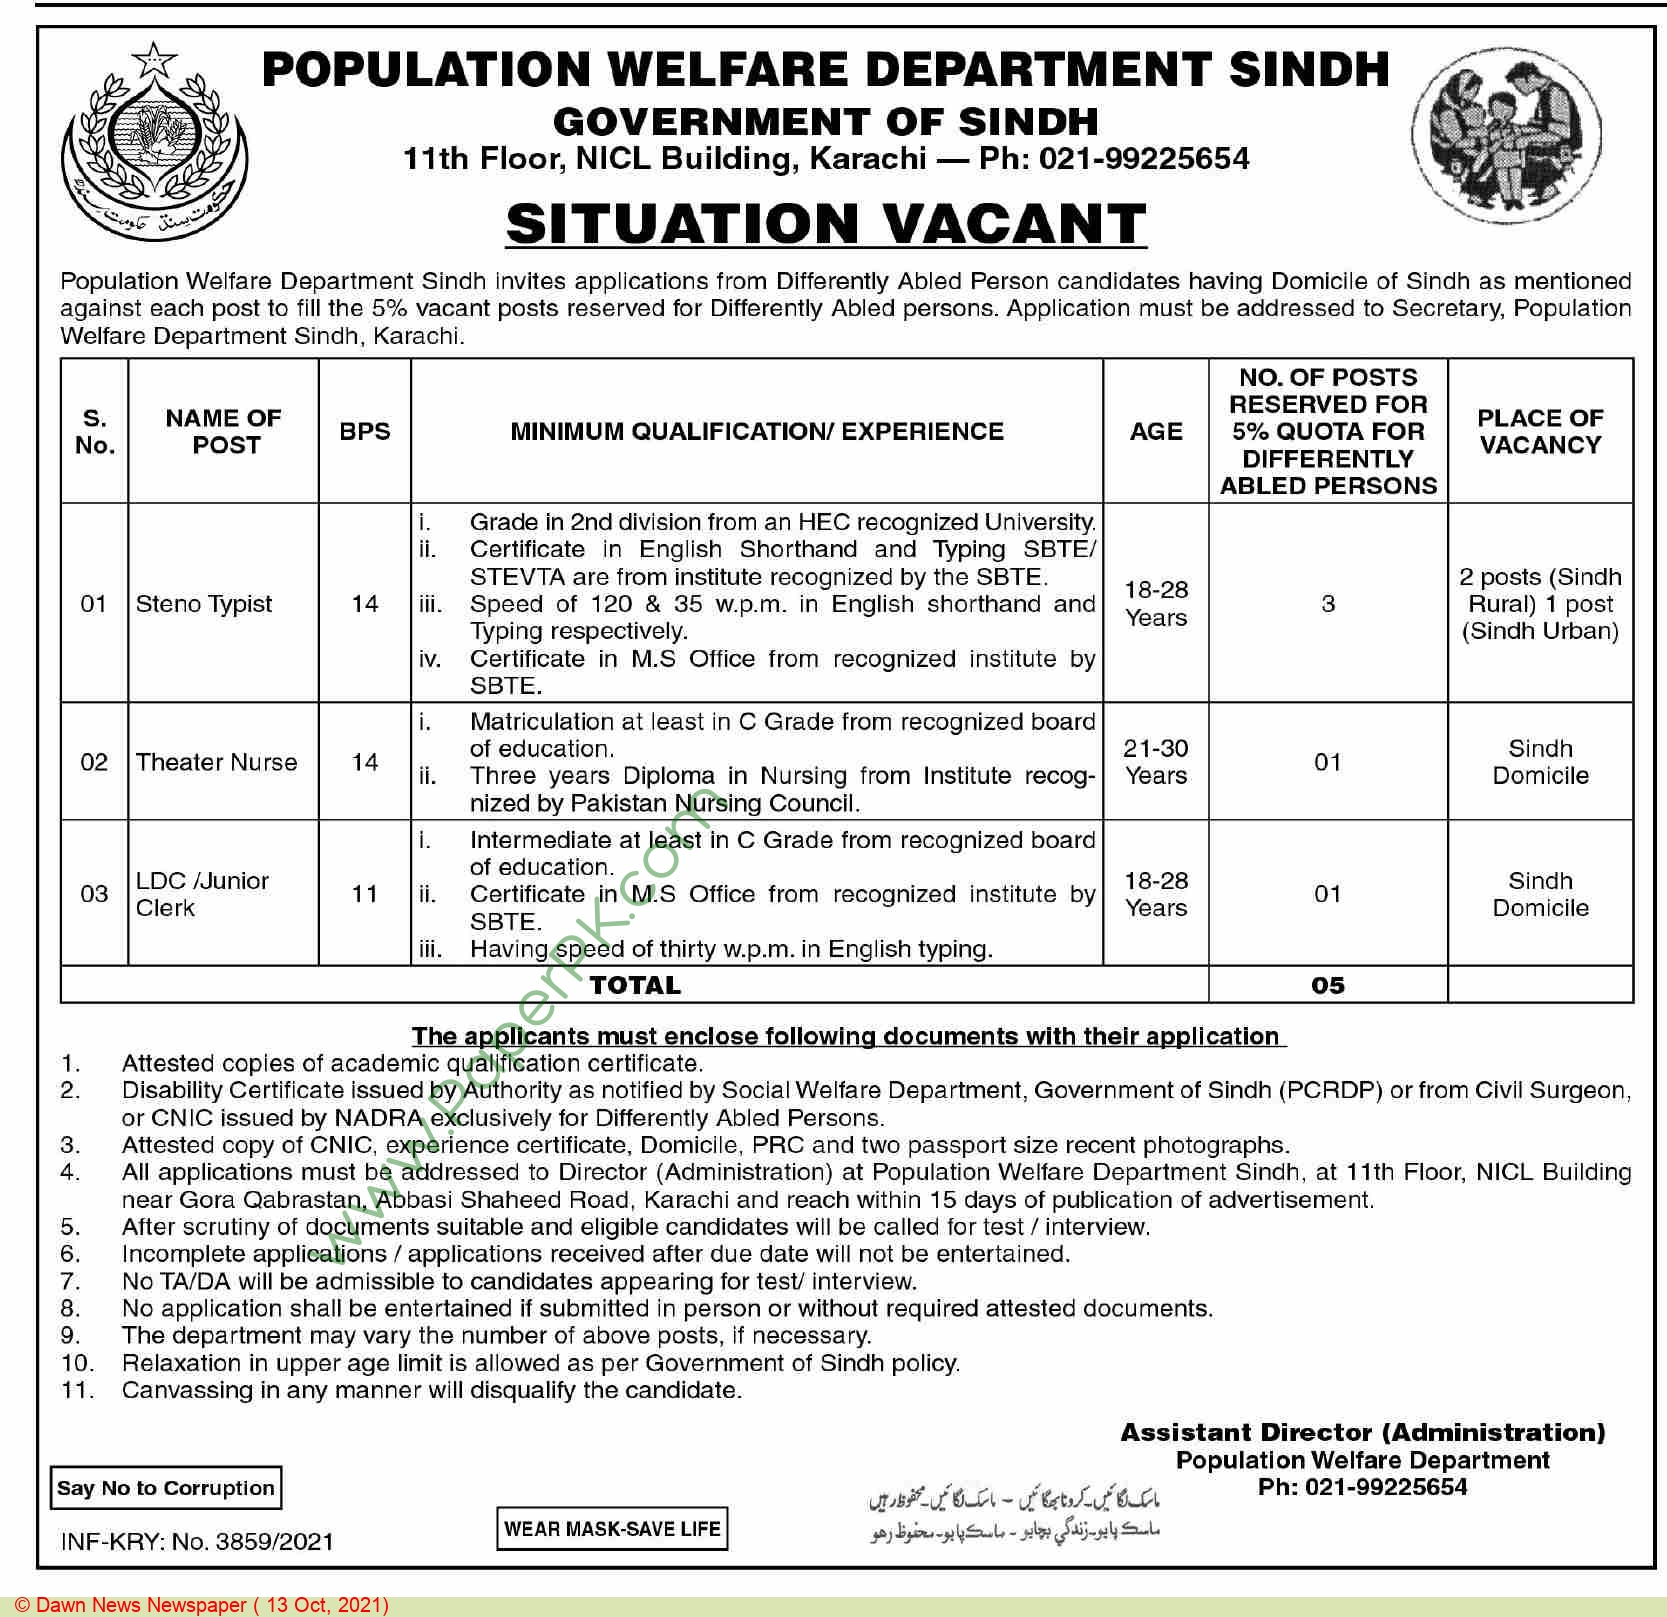 Population Welfare Department jobs newspaper ad for Theater Nurse in Karachi on 2021-10-13